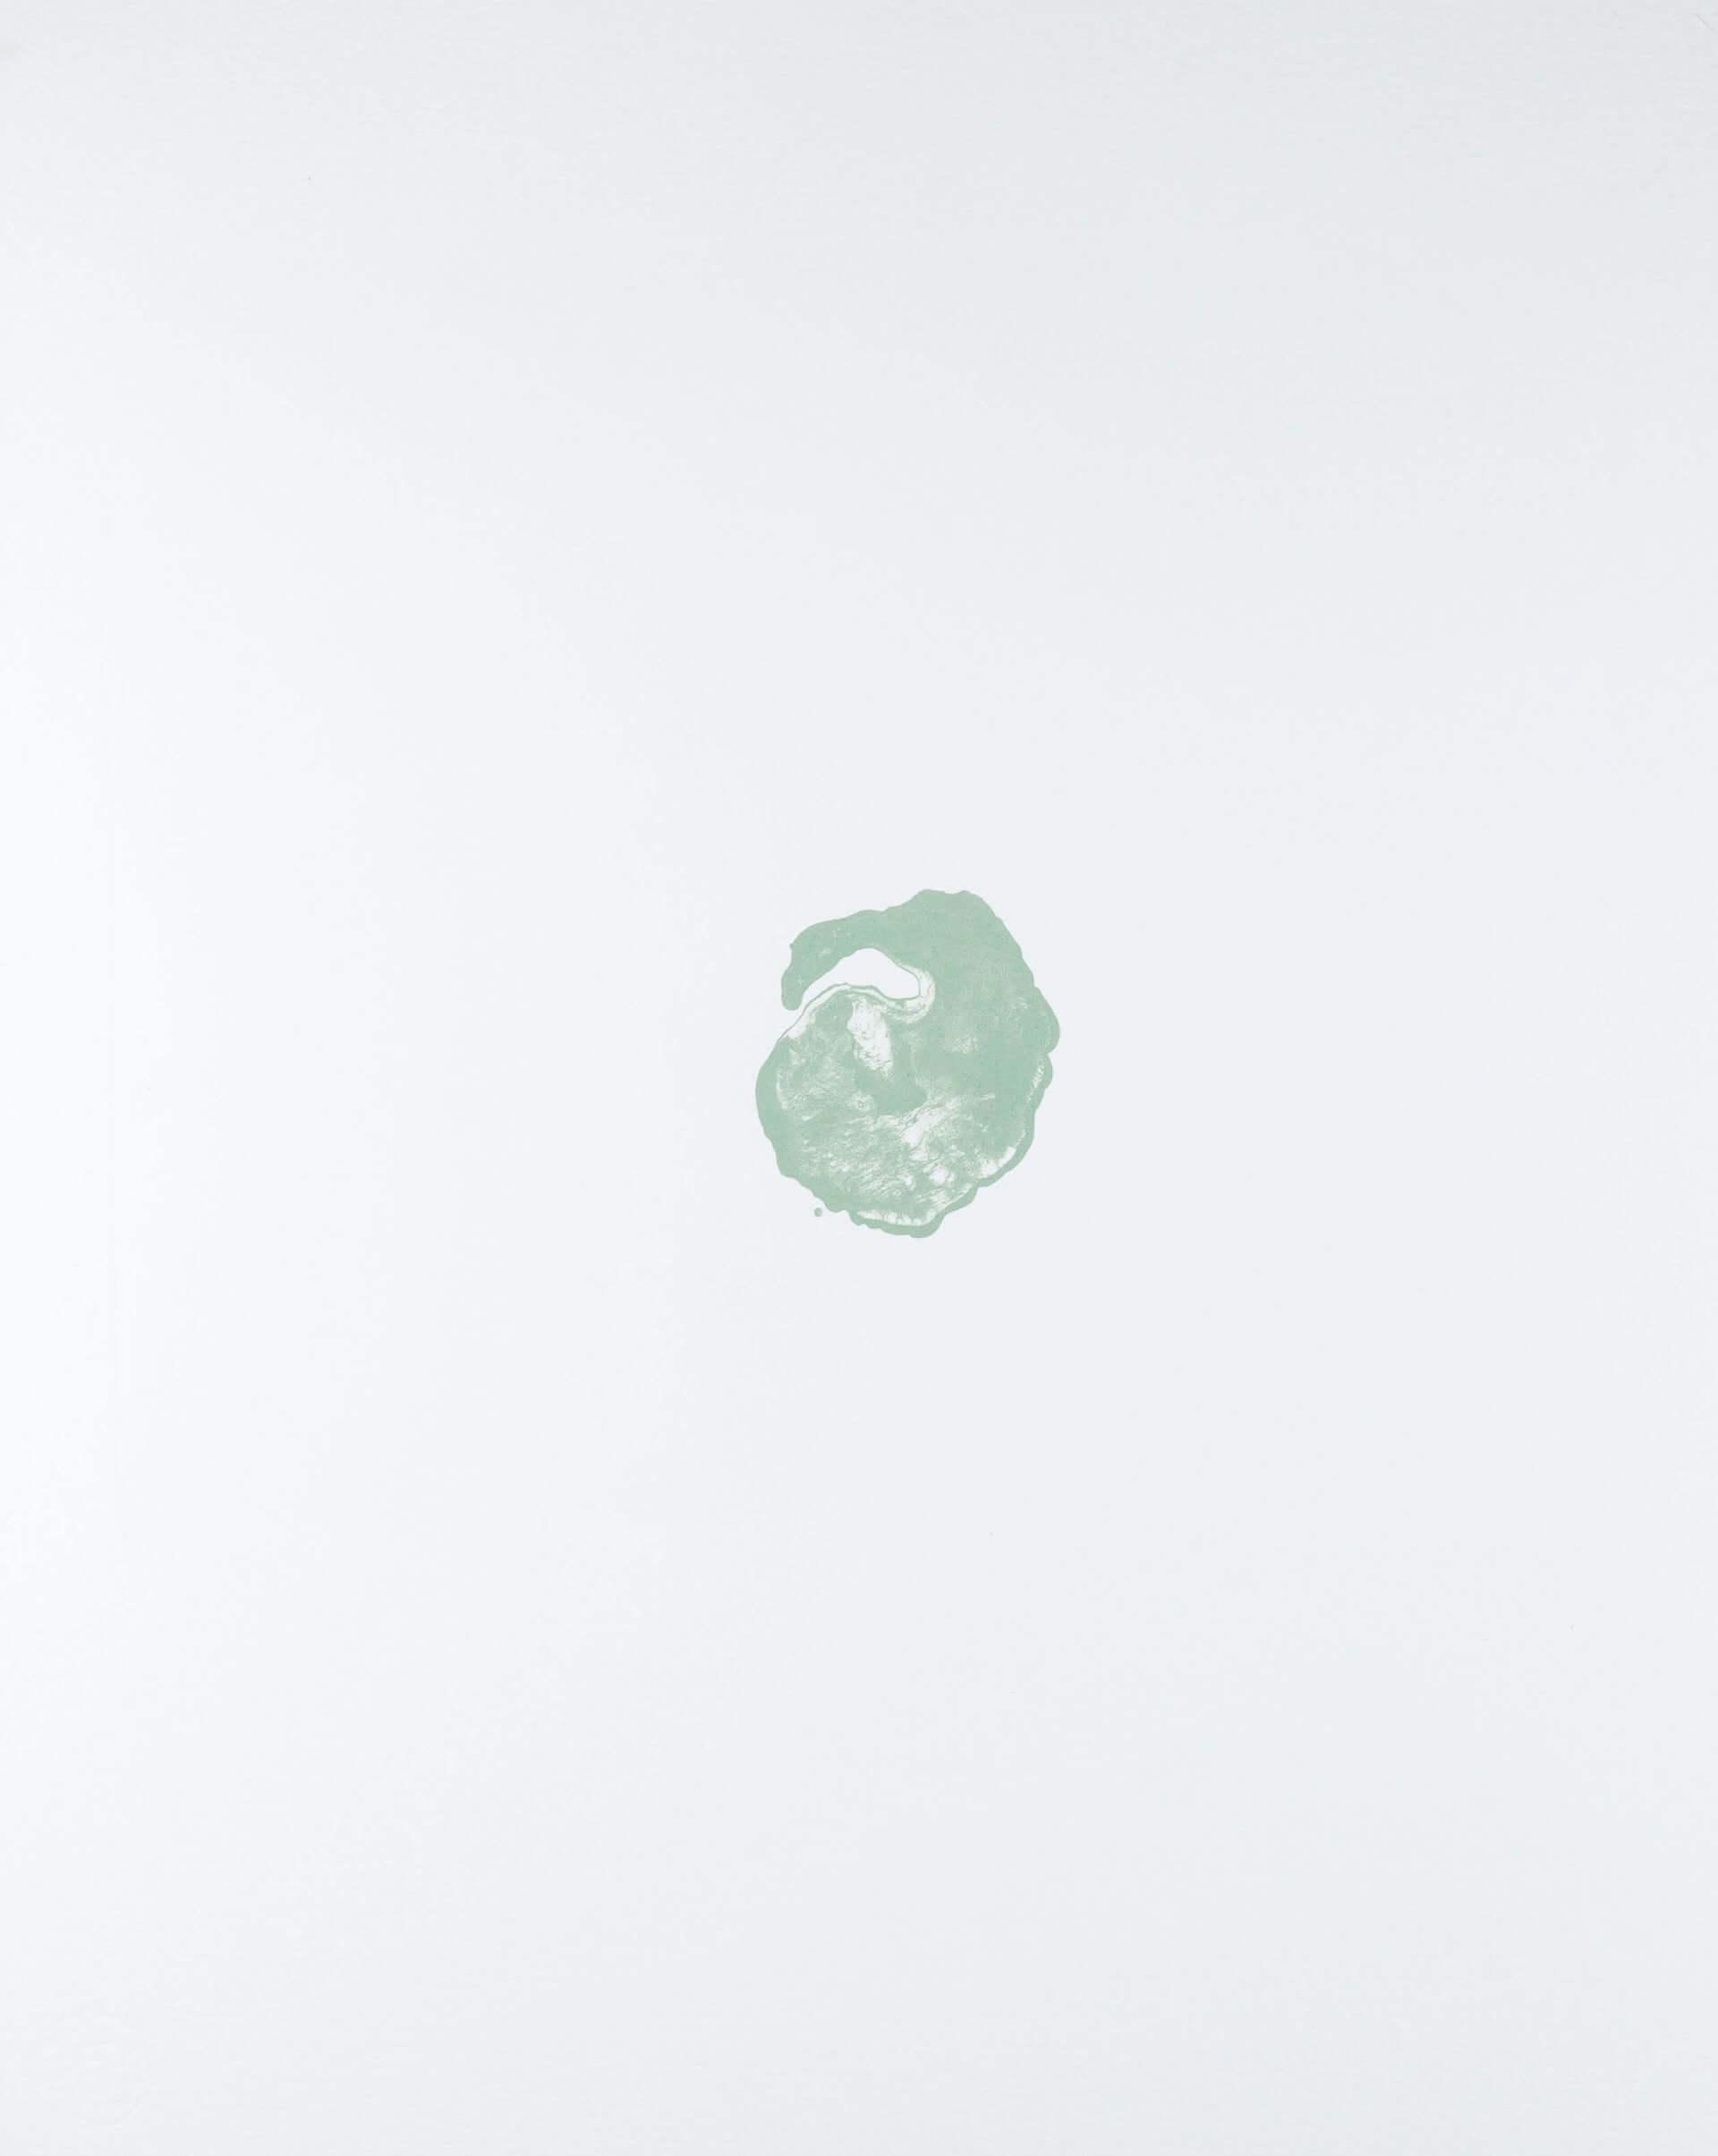 Katharina Albers, organism (growing)(A), 2017, Farblithographie, Unikat, 56x45 cm